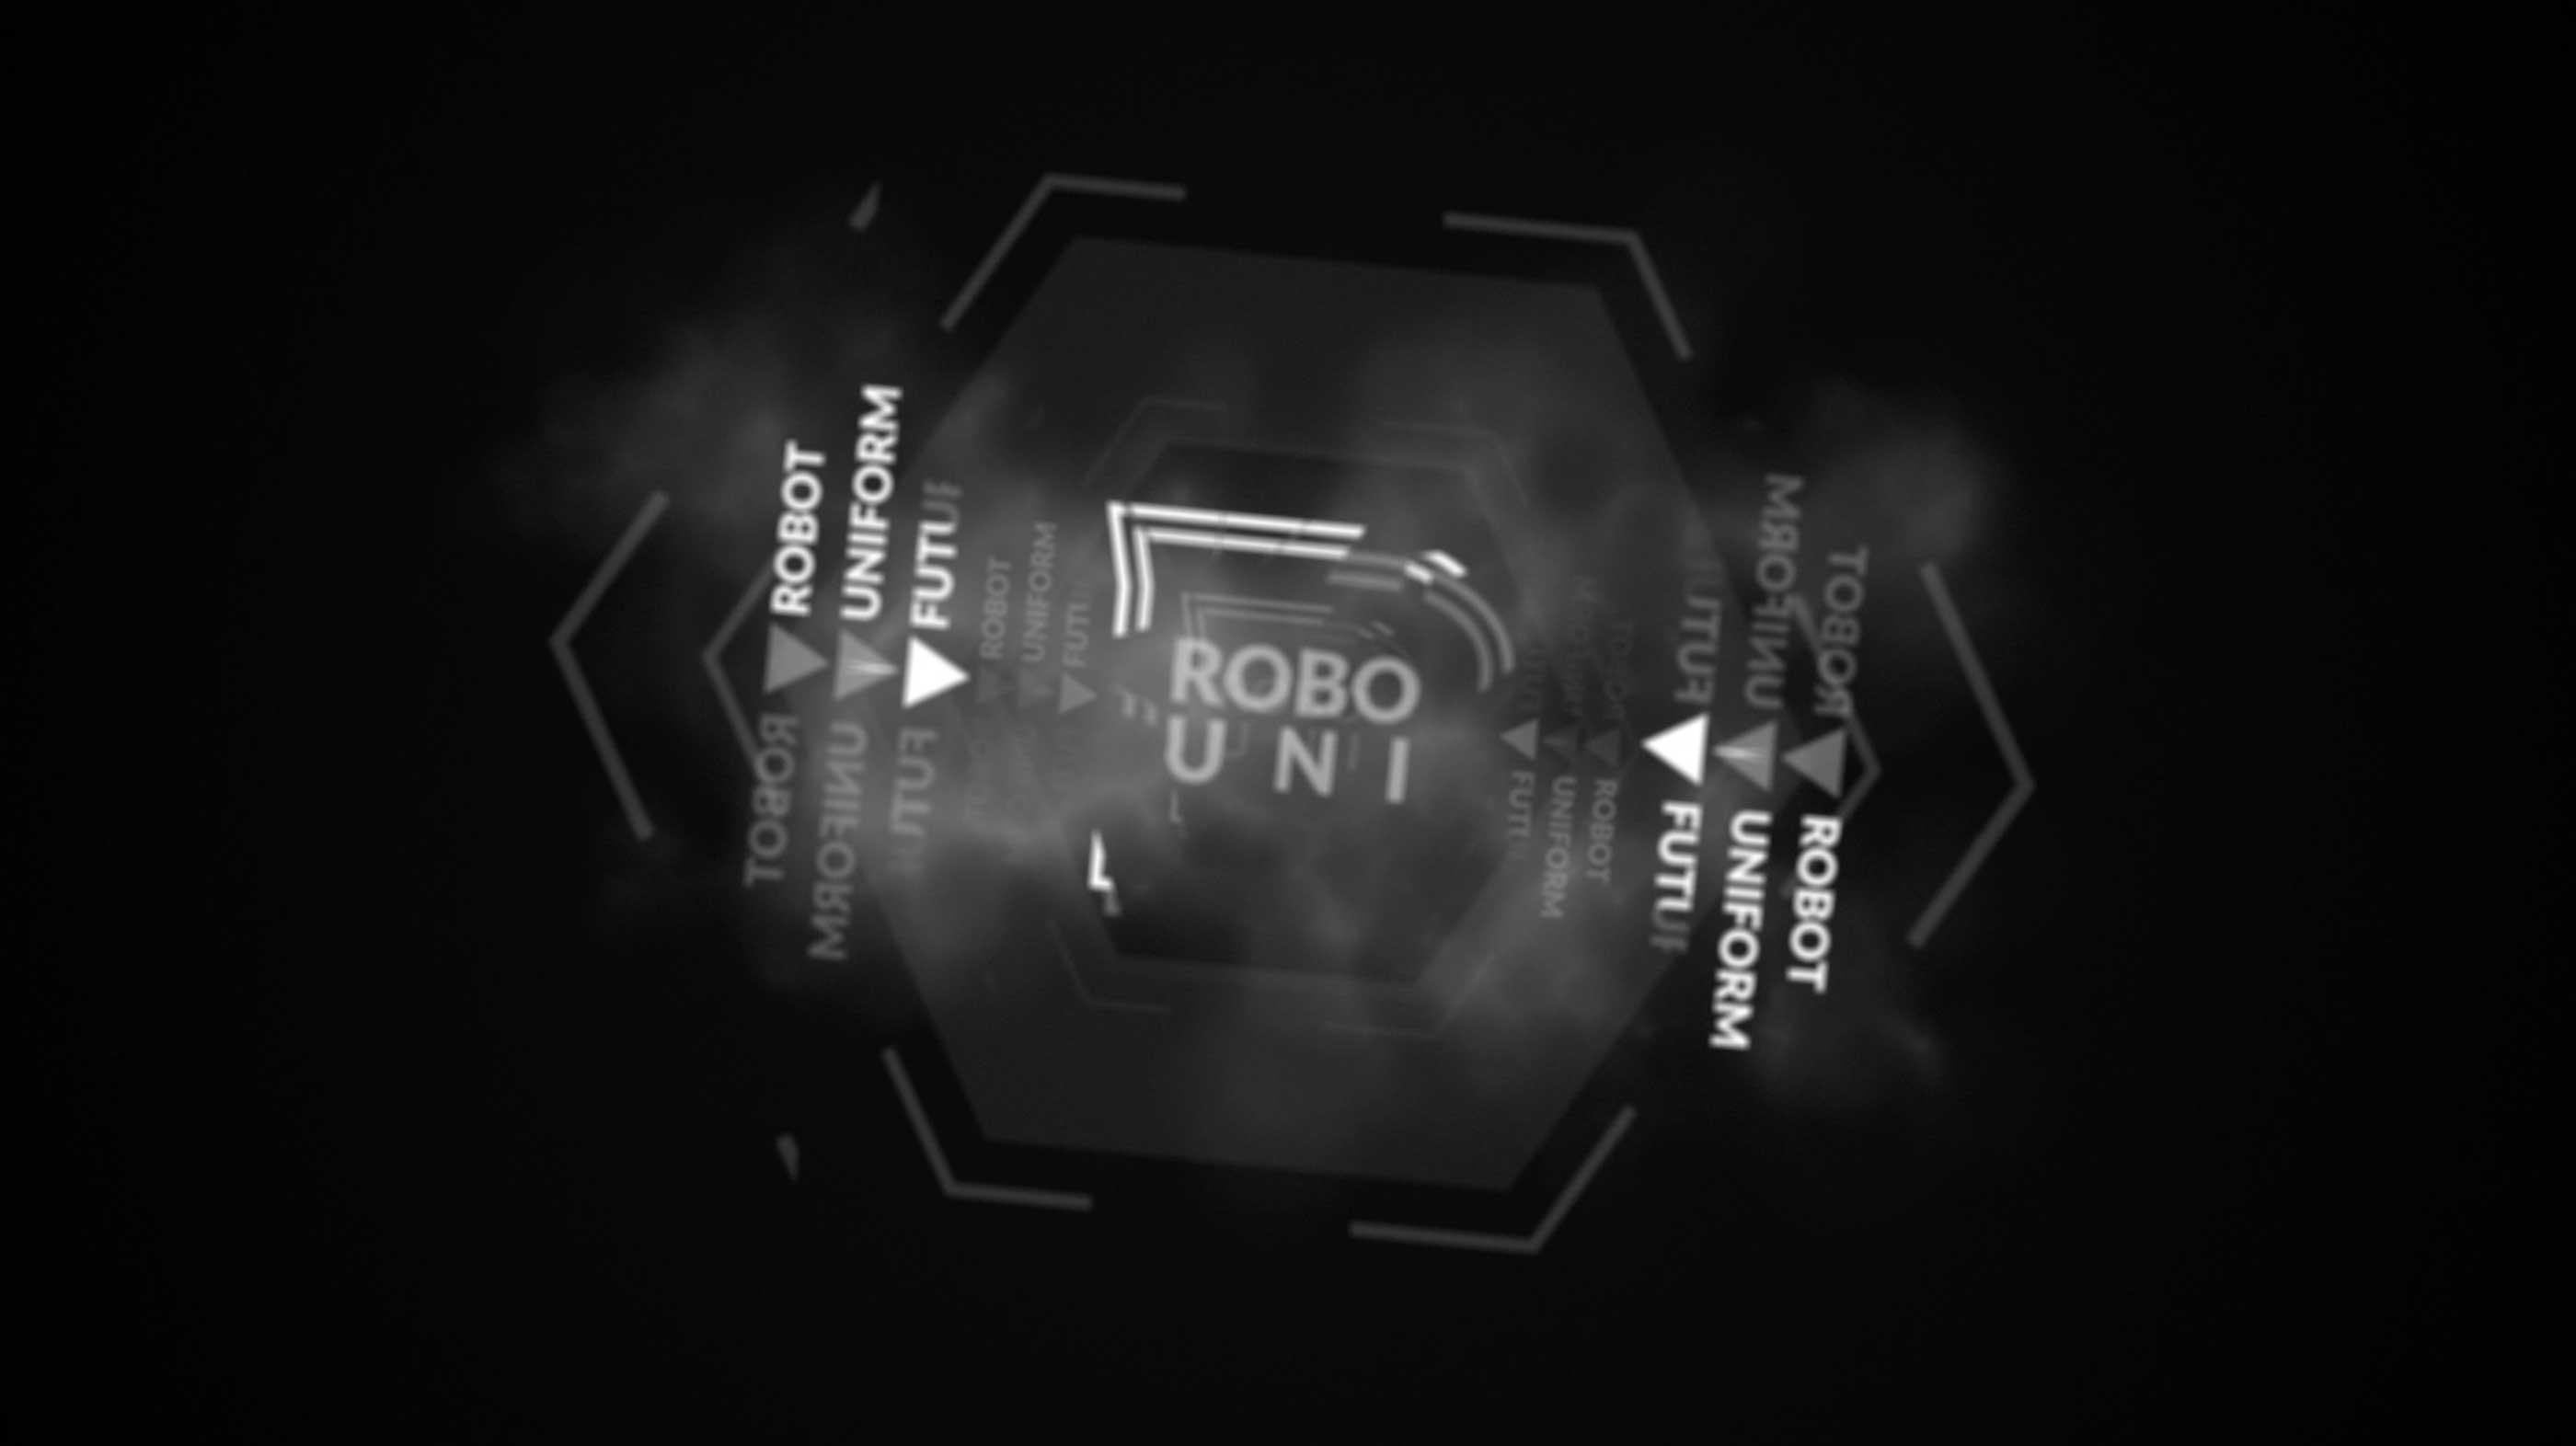 RocketRoad株式会社「ROBO-UNI OFFICIAL PV 2019ver」の制作デザインイメージ